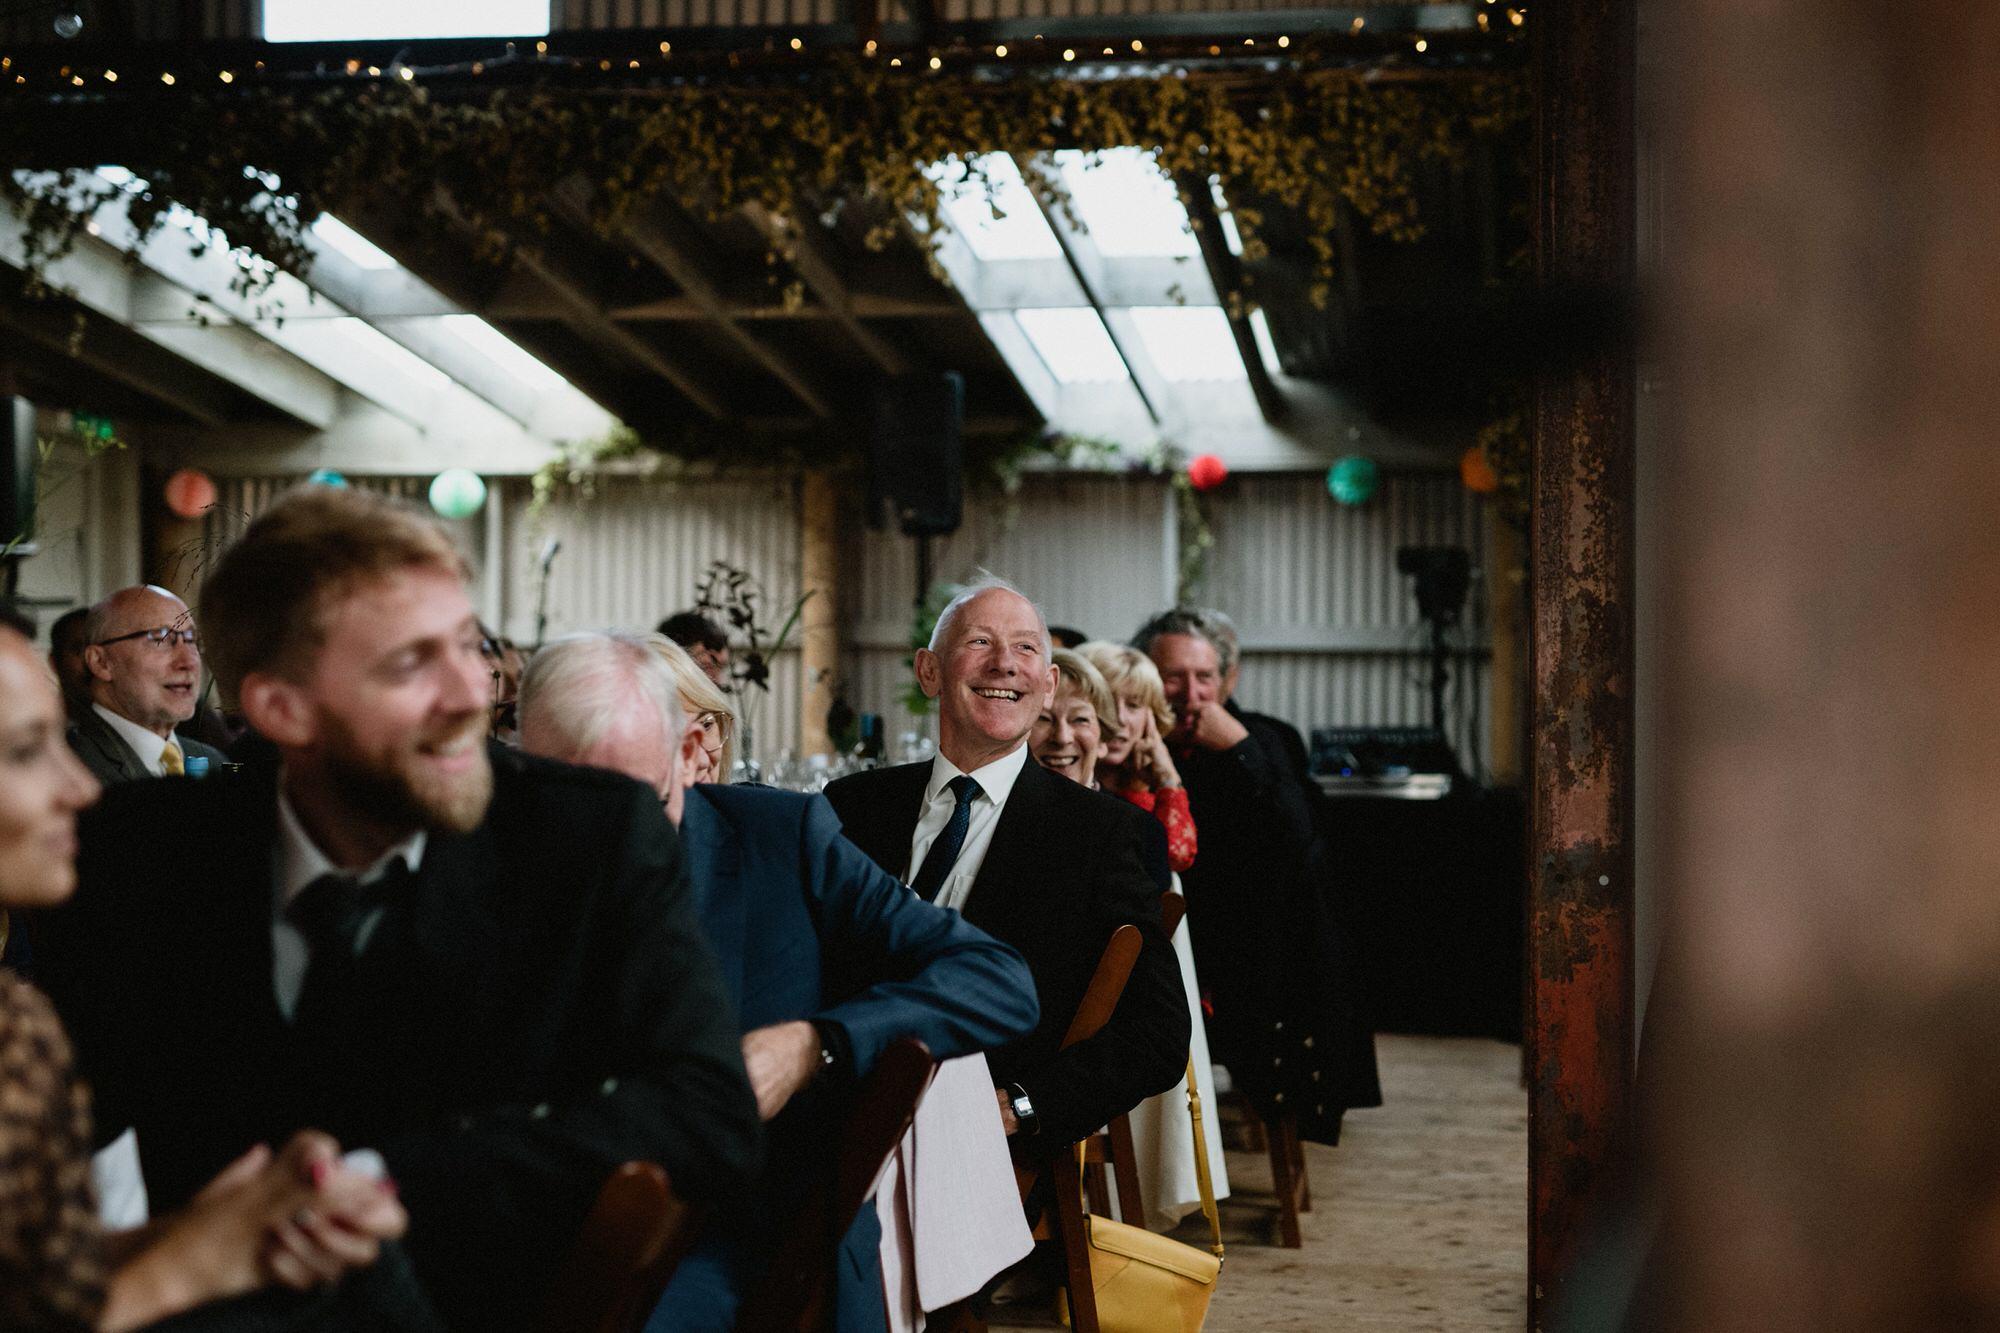 050 TIN SHED KNOCKRAICH WEDDING AUTUMN ZOE ALEXANDRA PHOTOGRAPHY